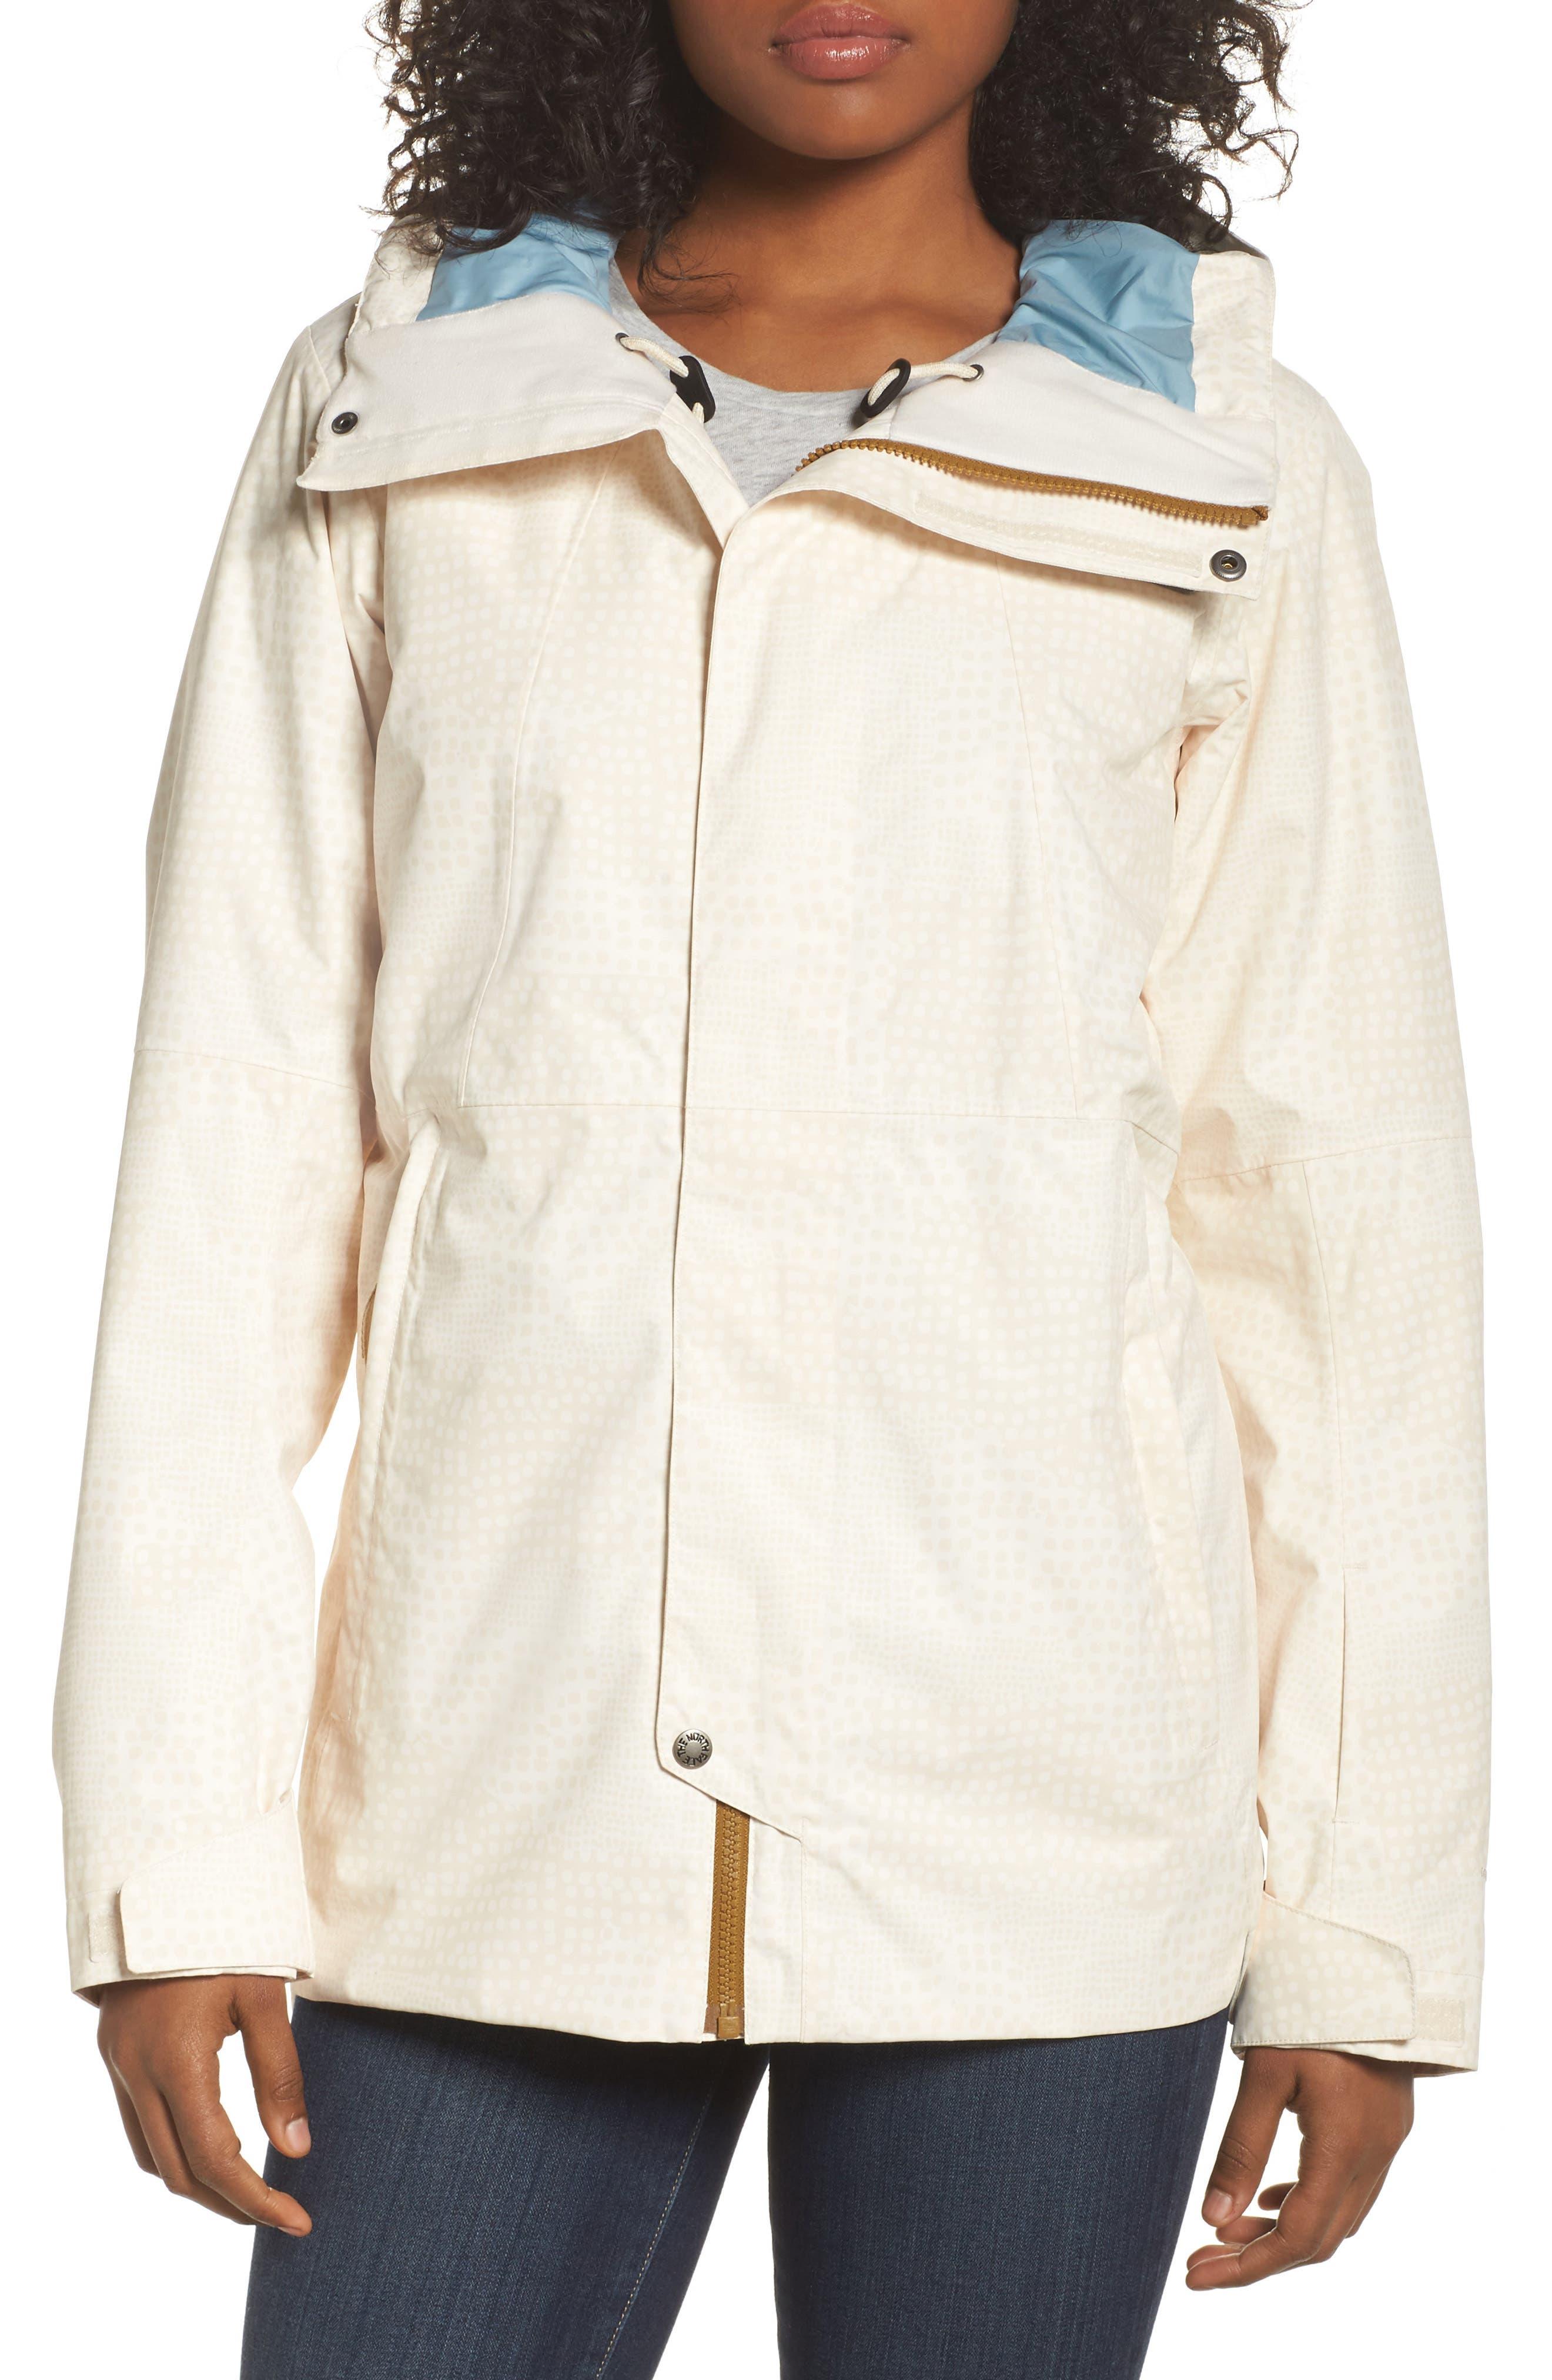 Alternate Image 1 Selected - The North Face Superlu Weatherproof Hooded Ski Jacket